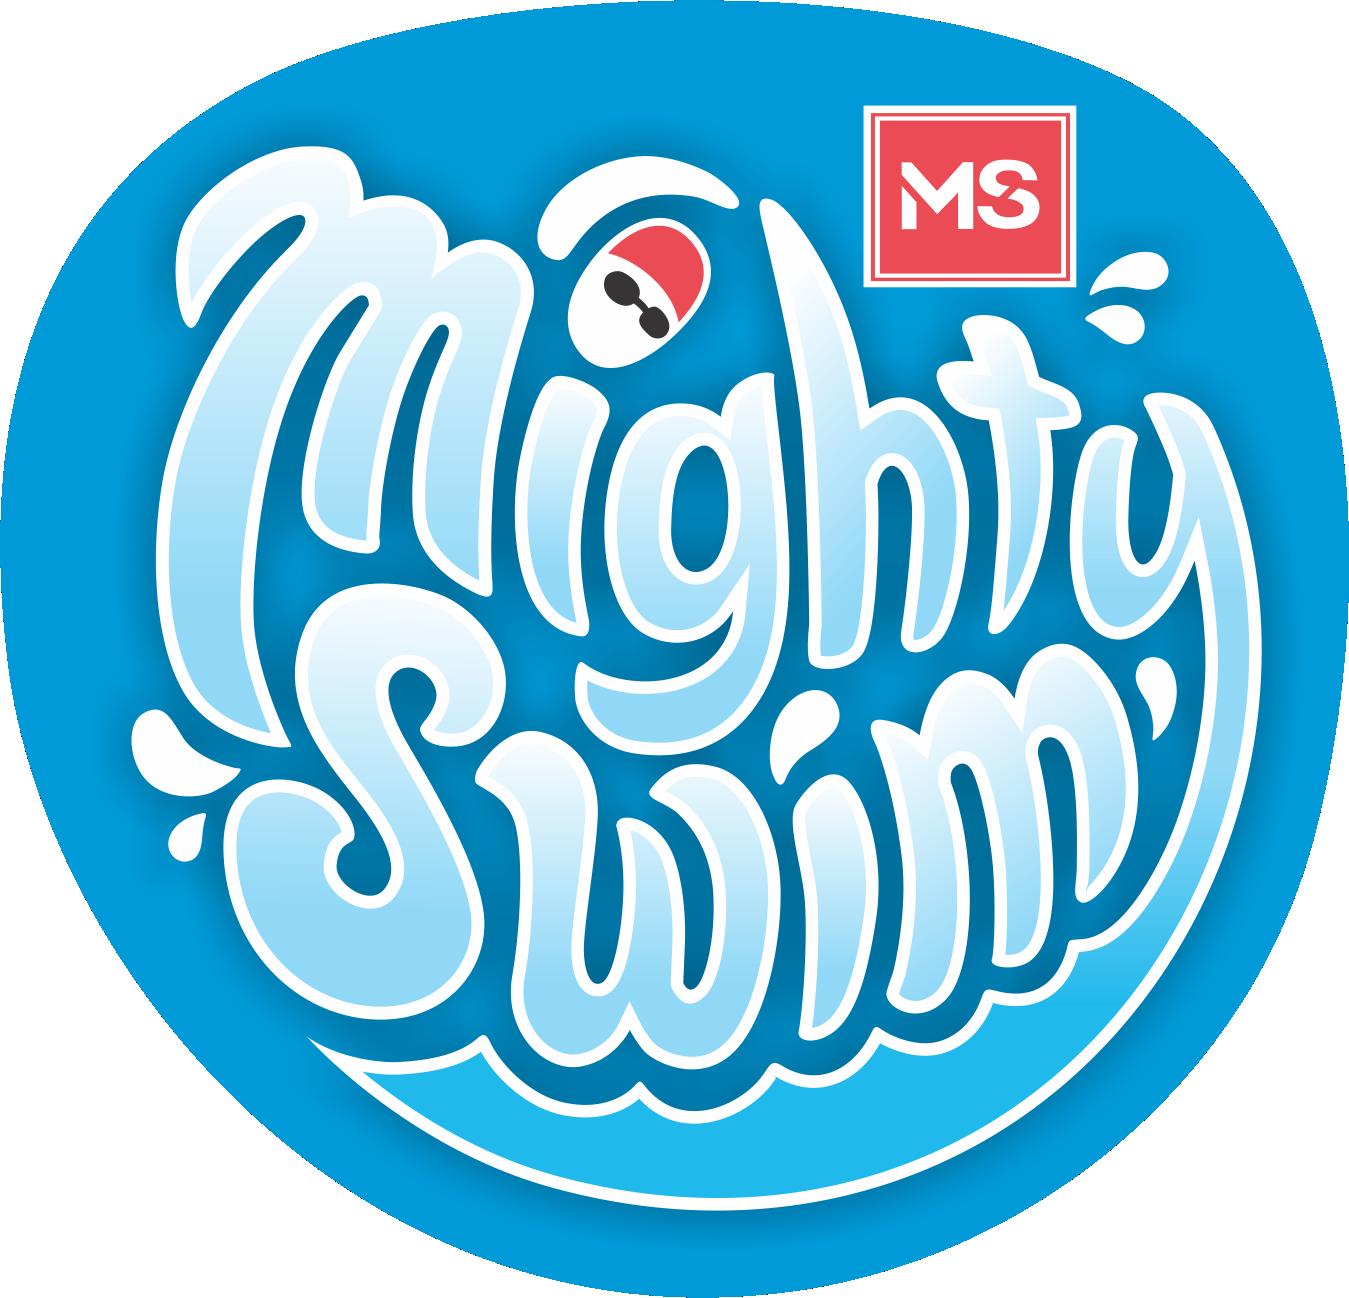 MS Mighty Swim